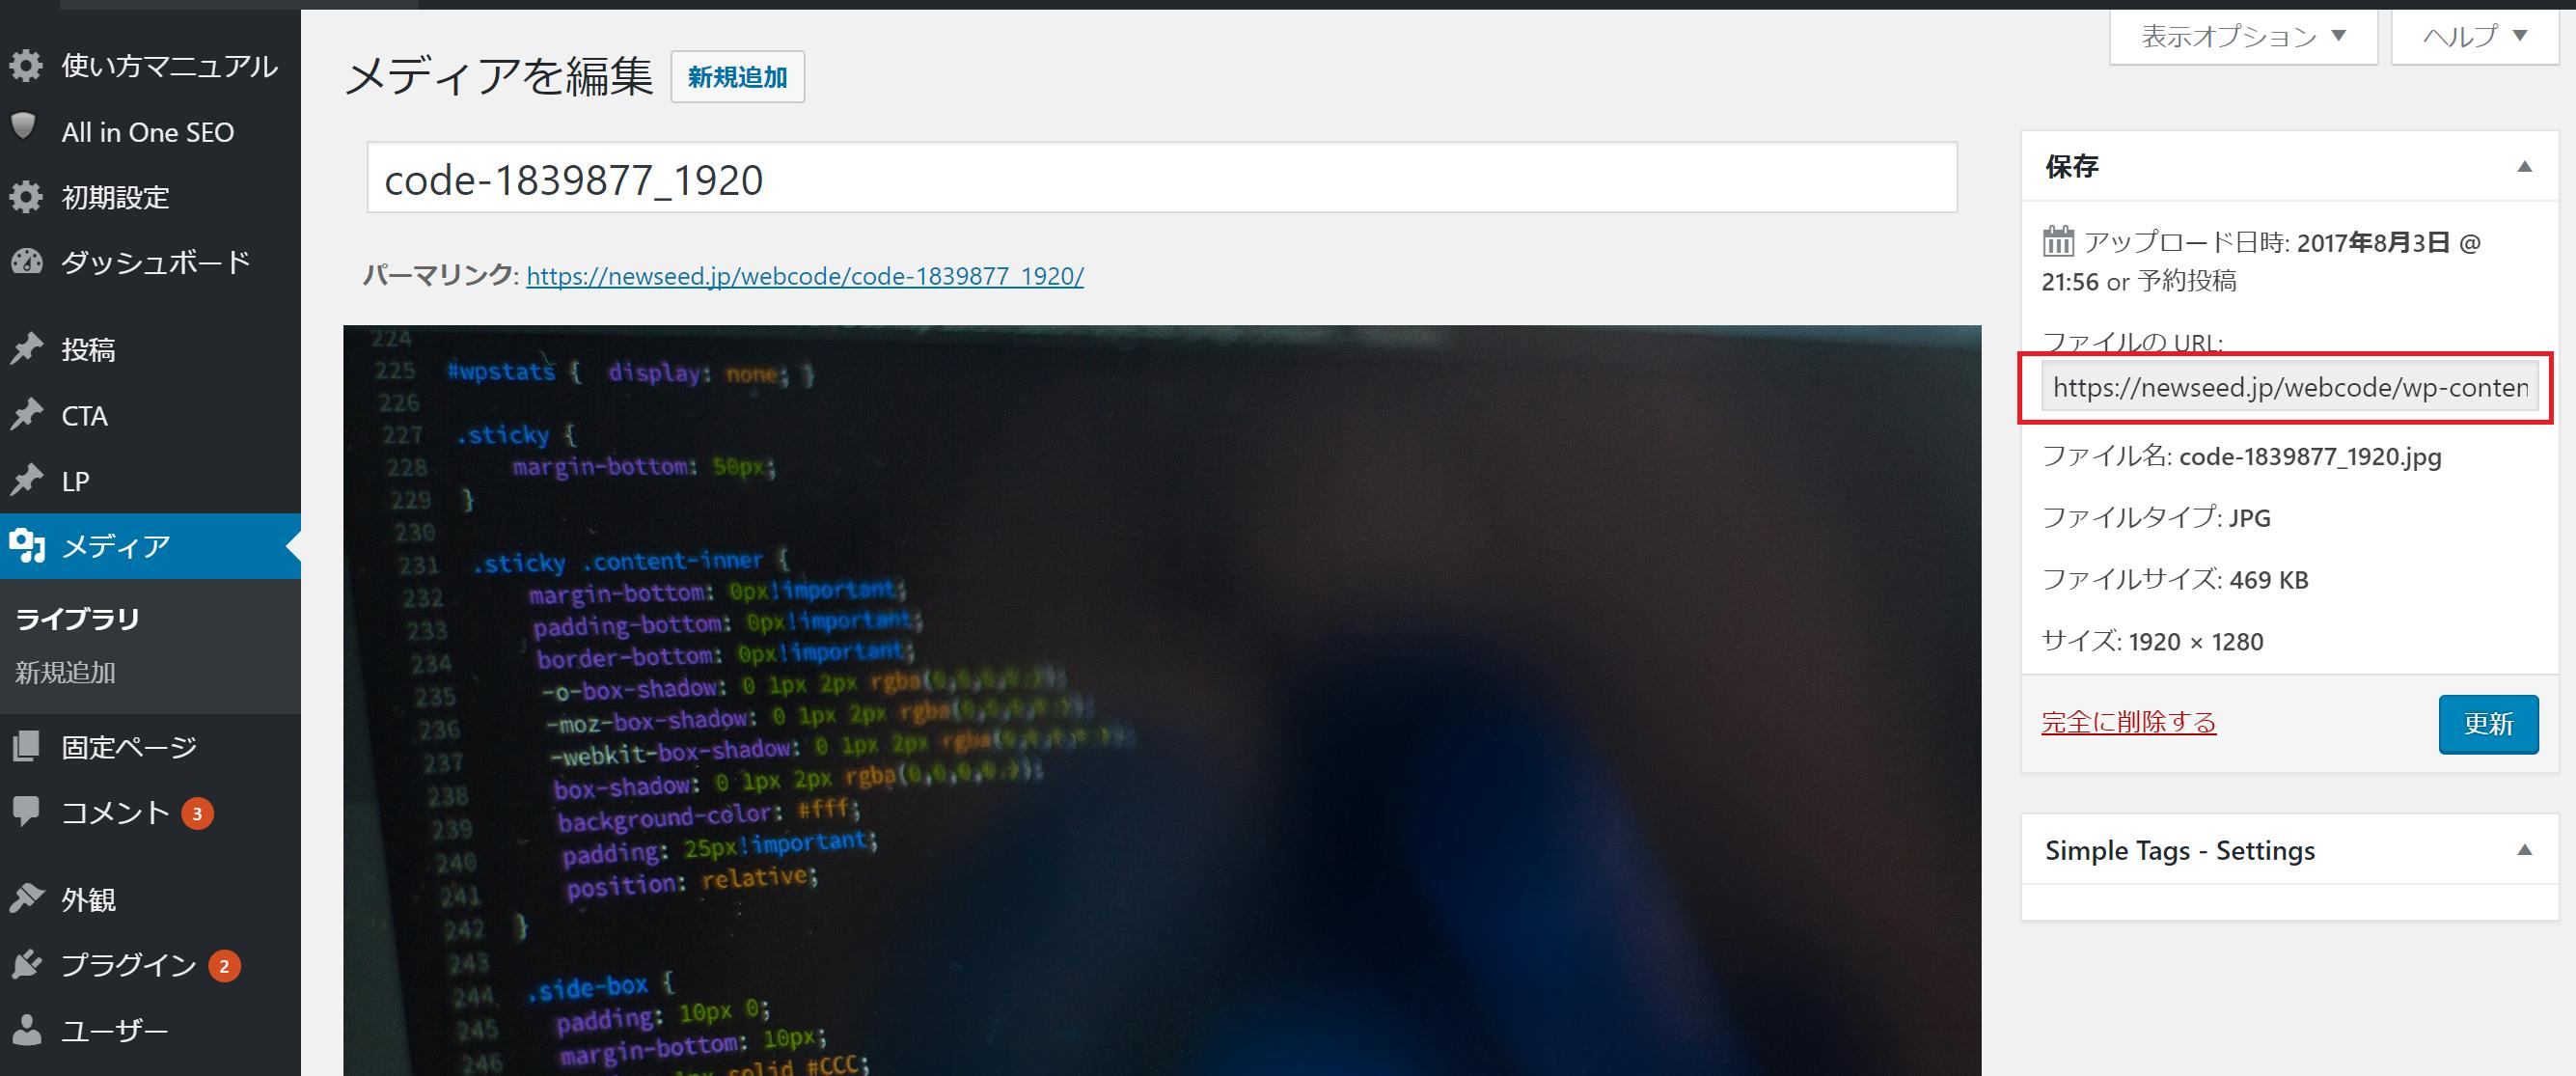 picture custom - wordpressのショートコードの作成方法・使い方・注意点まとめ